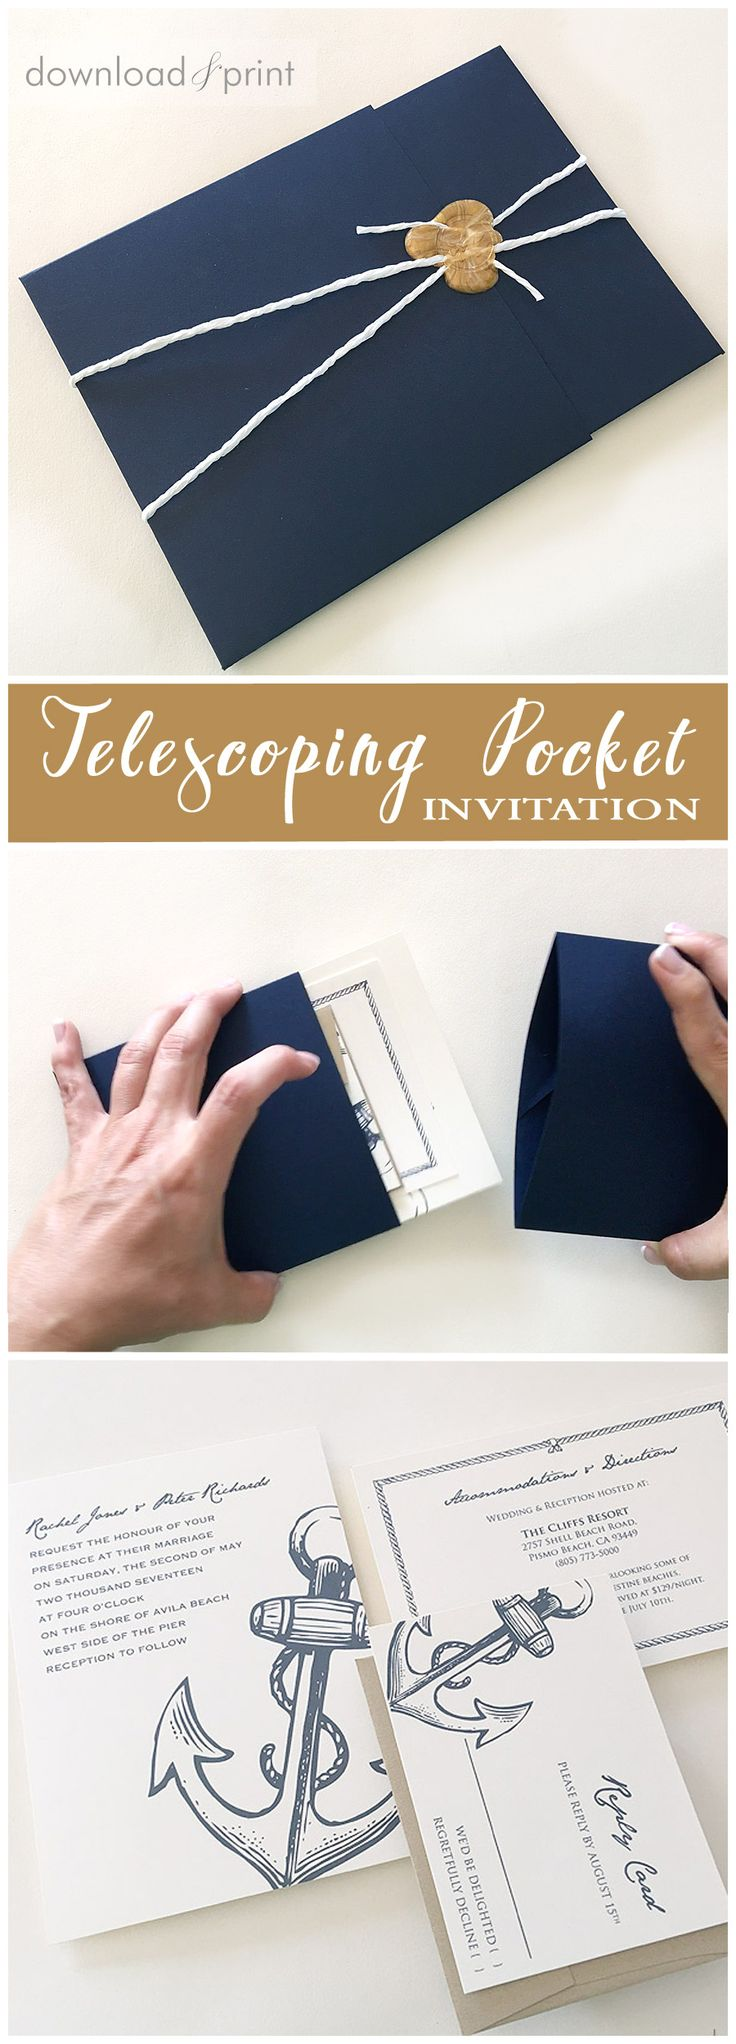 Unique telescoping pocket wedding invitation. Hack from two invitation envelopes! Slide the pocket apart to reveal the invitation inside.